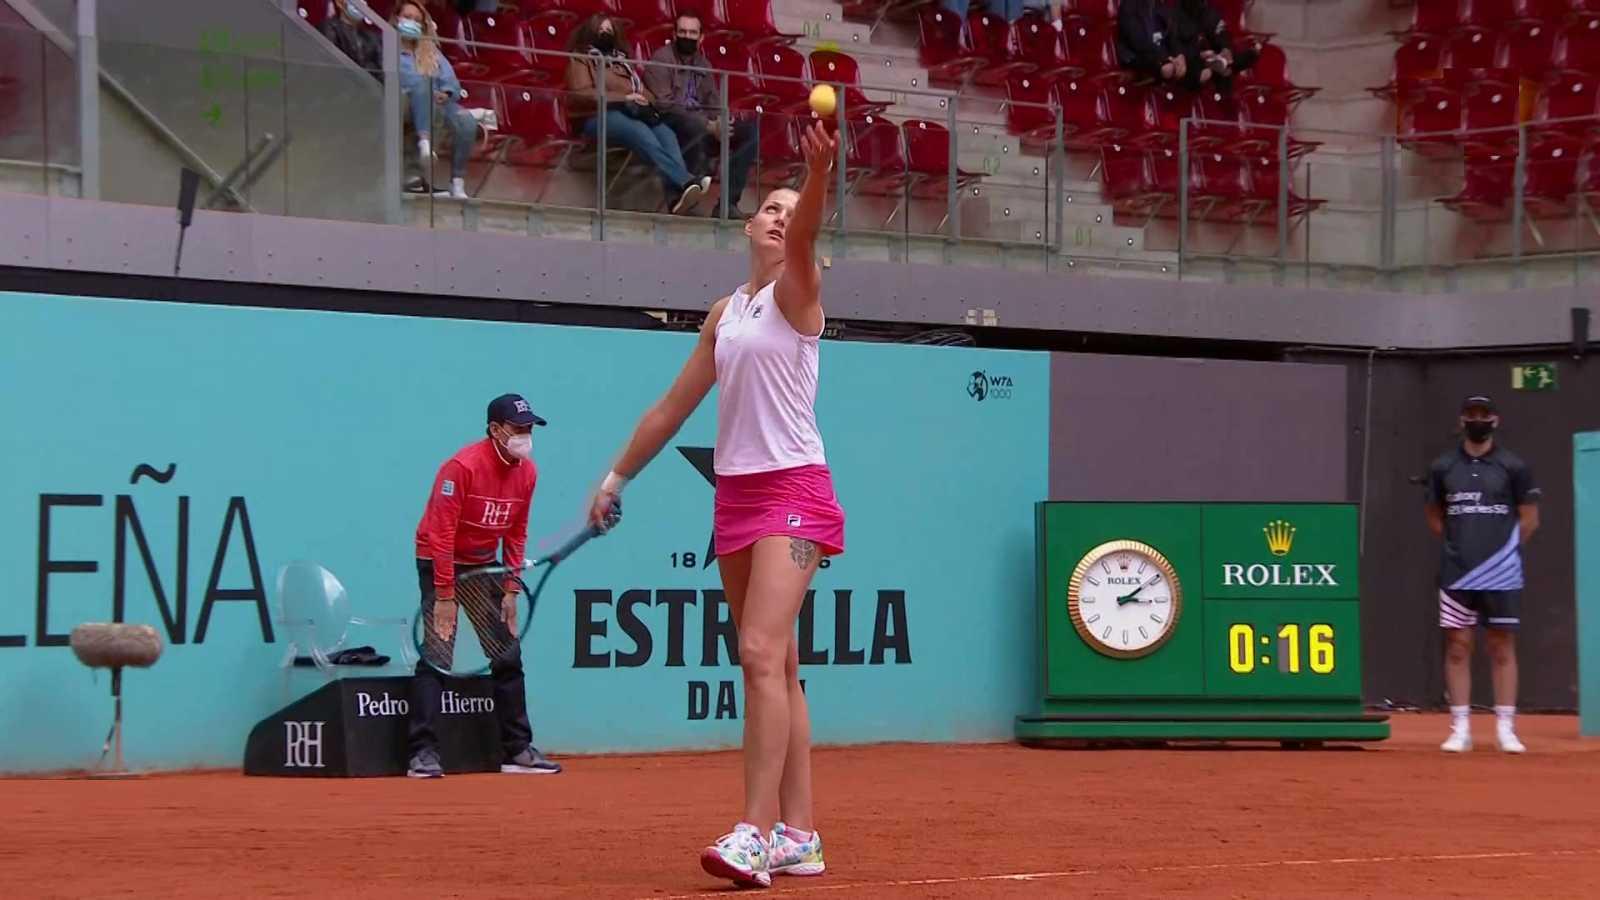 Tenis - ATP/WTA Mutua Madrid Open.: K. Pliskova - A. Pavlyuchenkova - Ver ahora